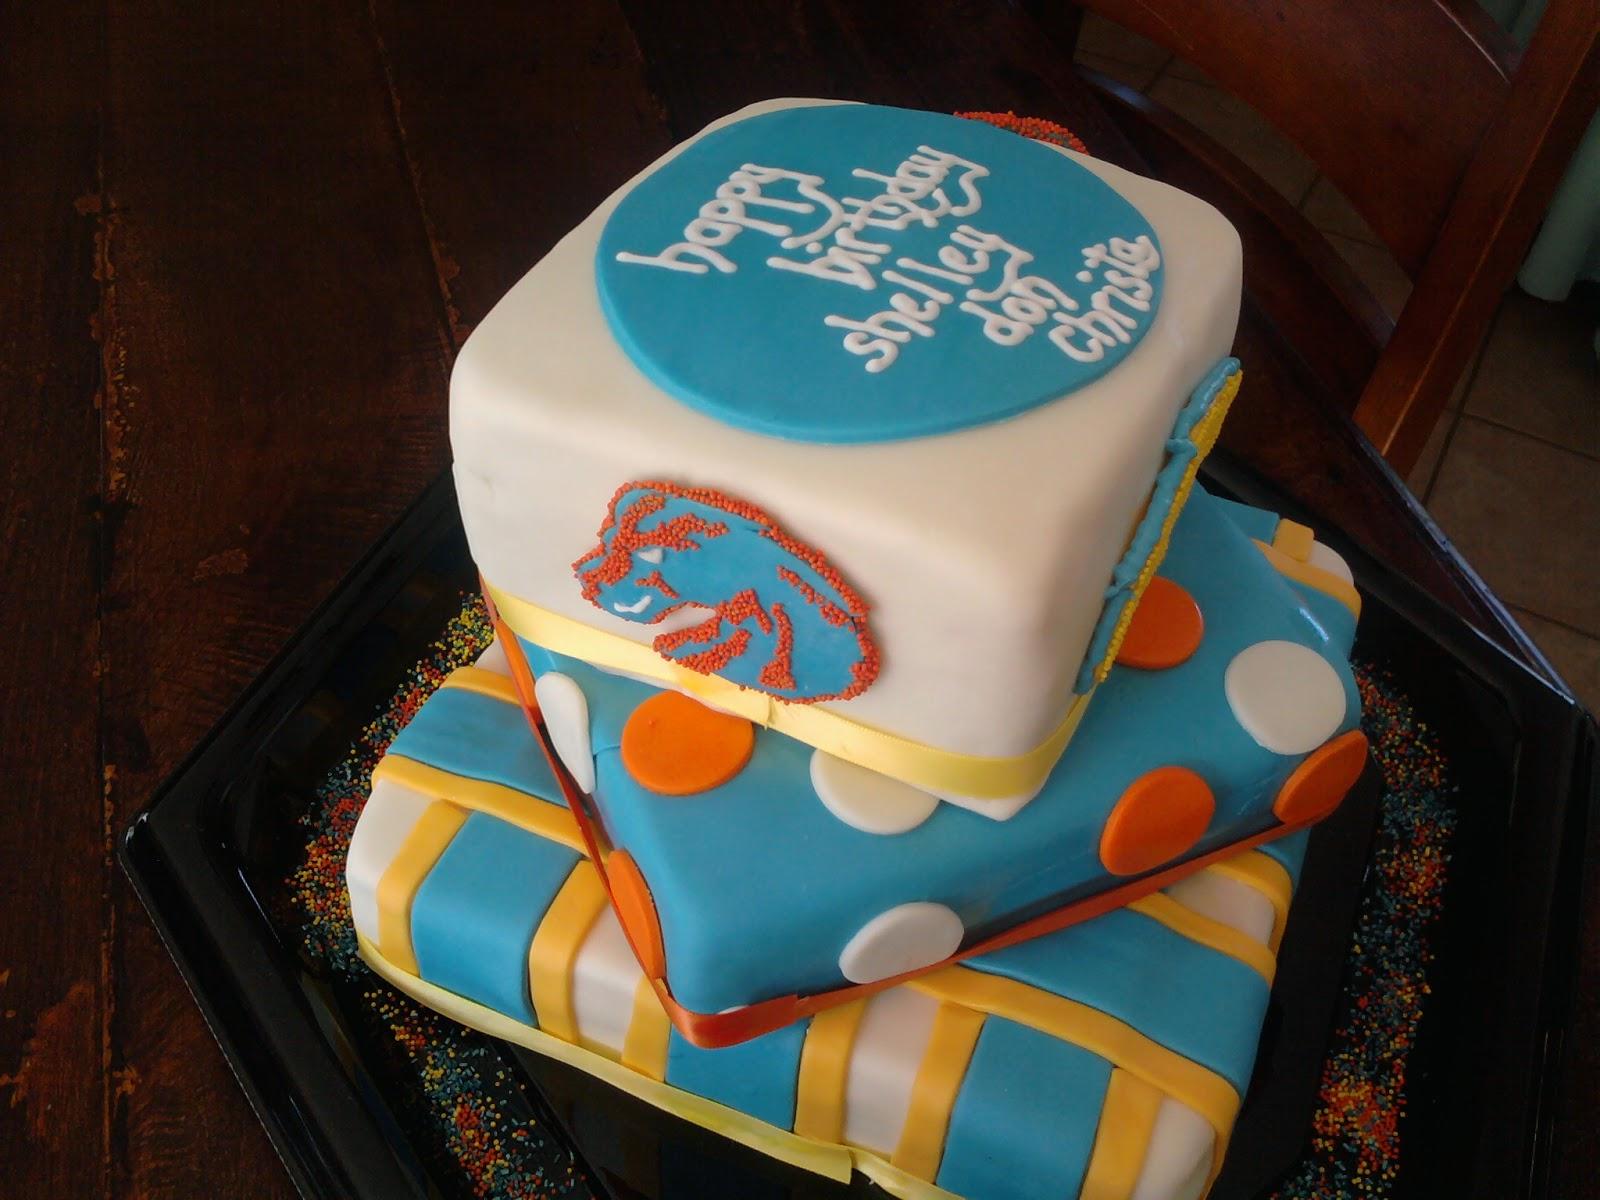 San Diego Chargers Cake Pan